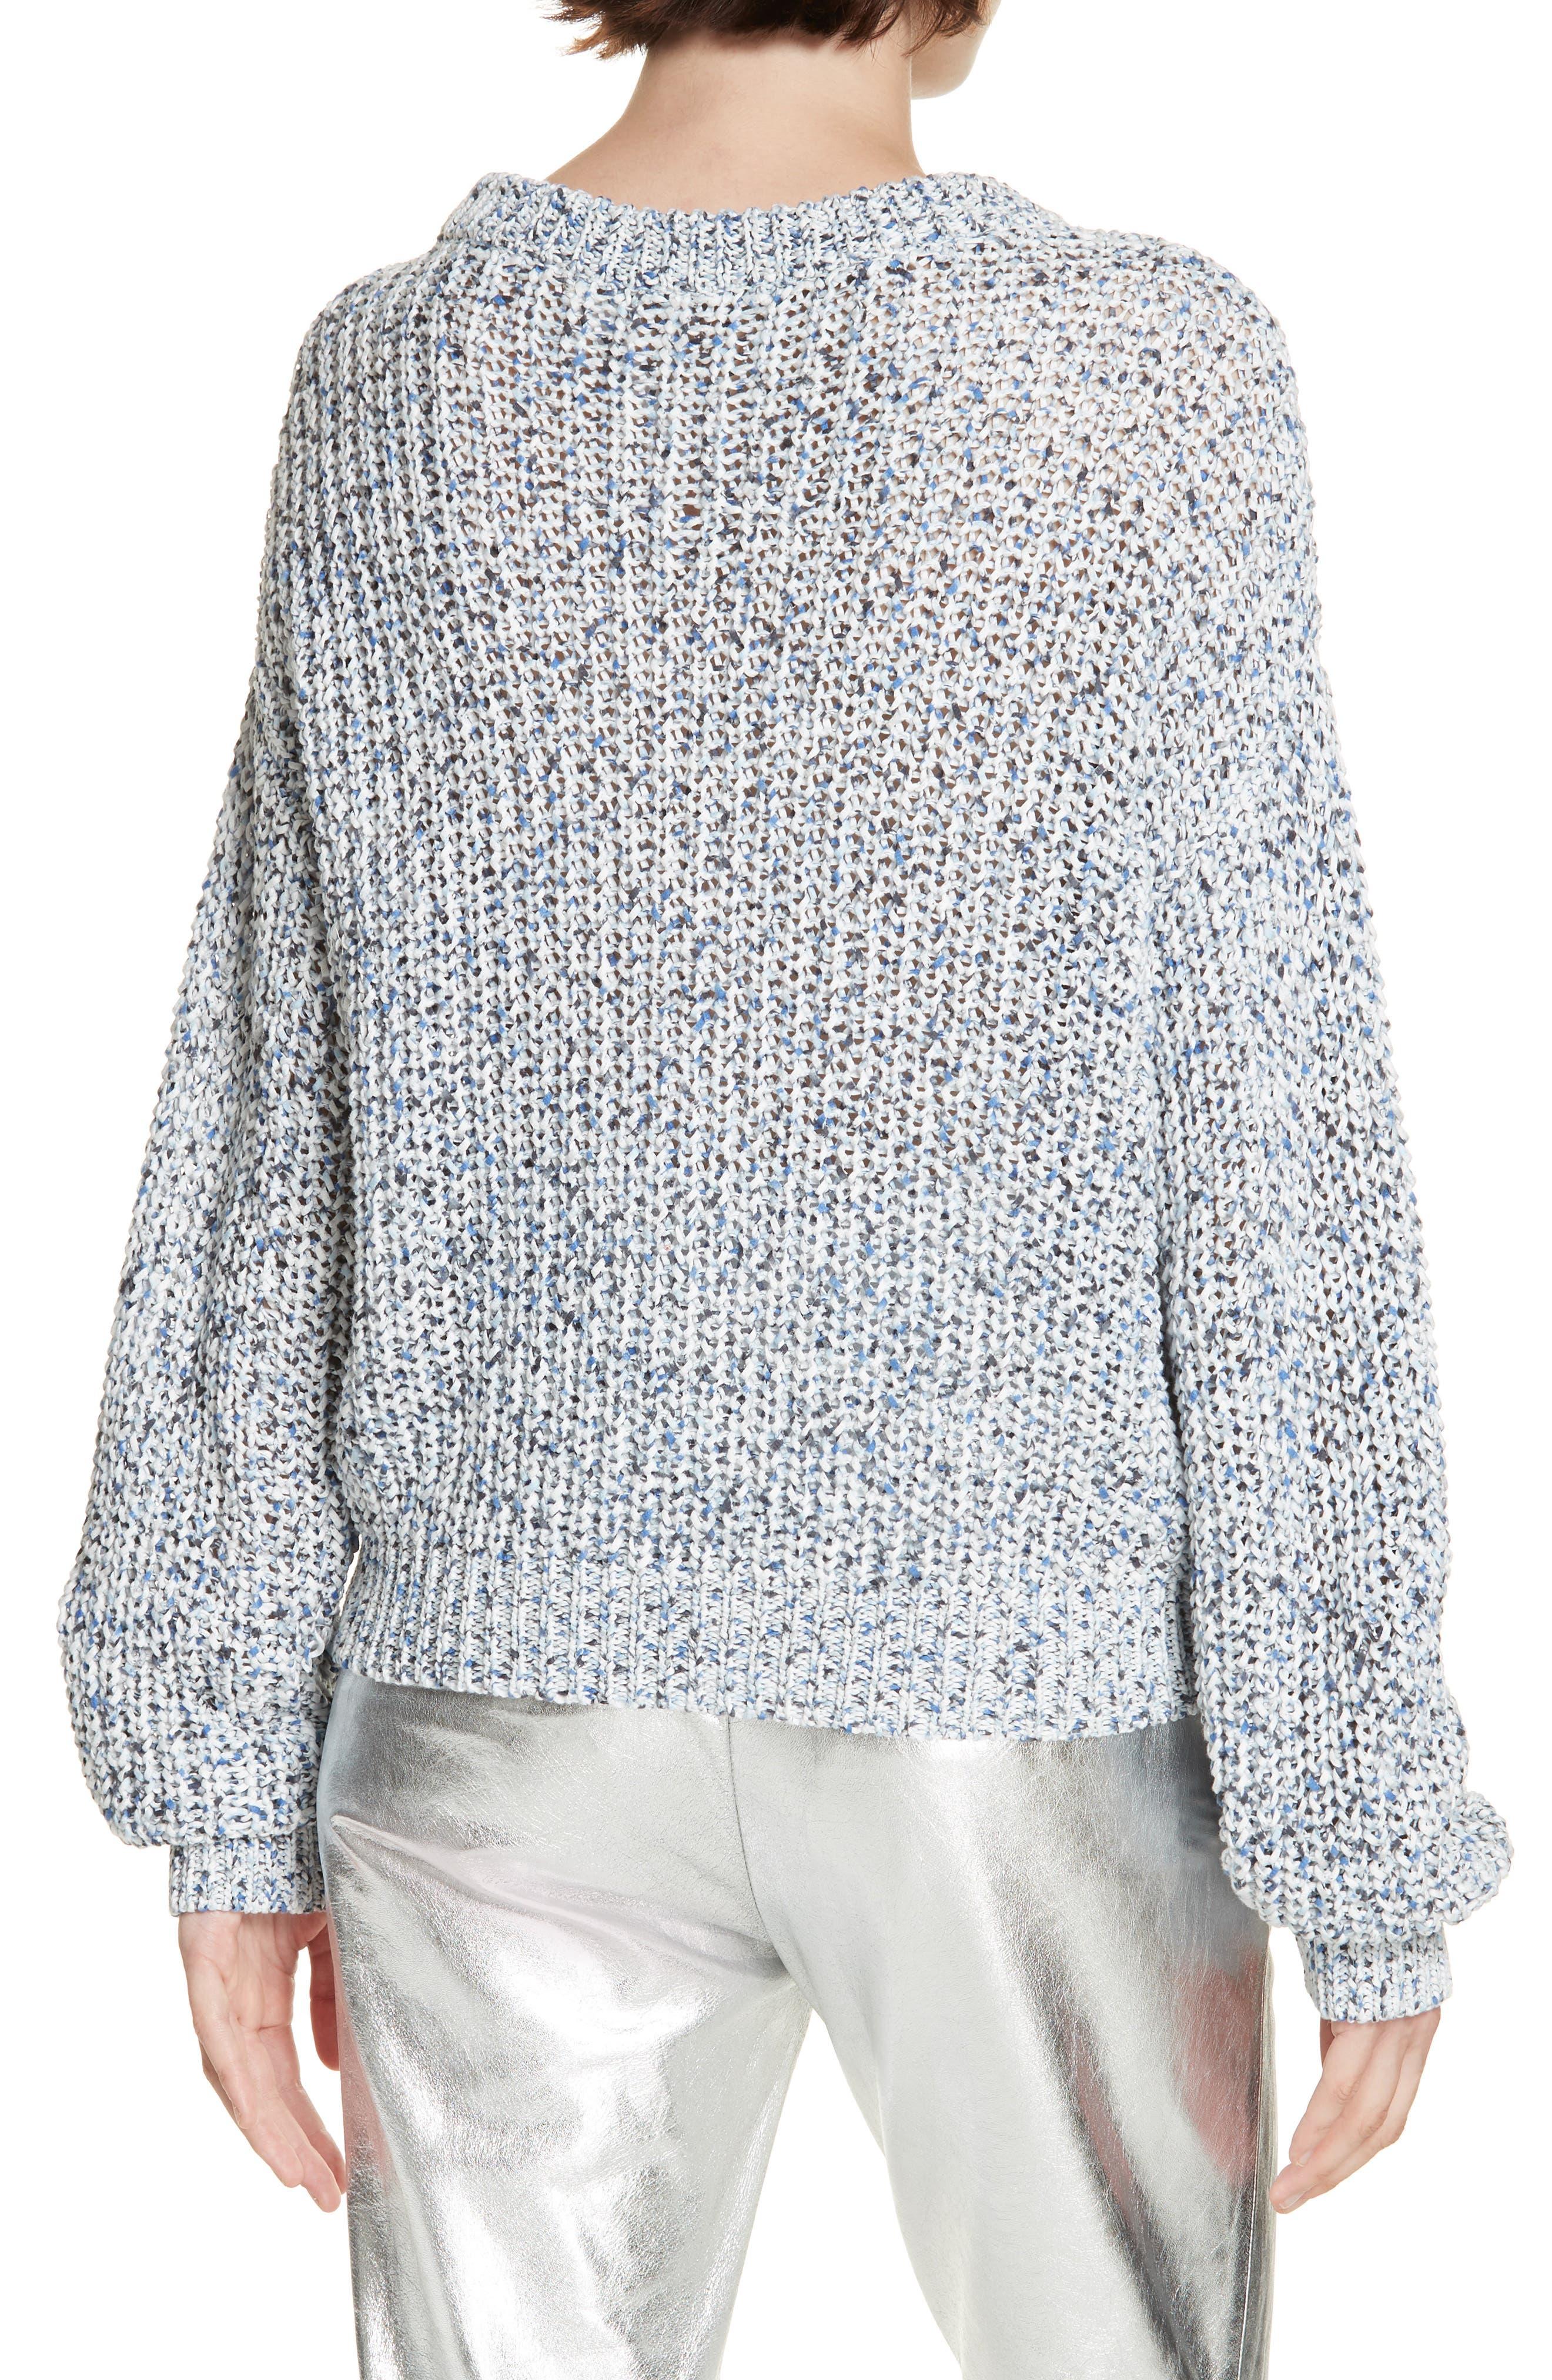 Ryce Cotton Sweater,                             Alternate thumbnail 2, color,                             BLUE MULIT